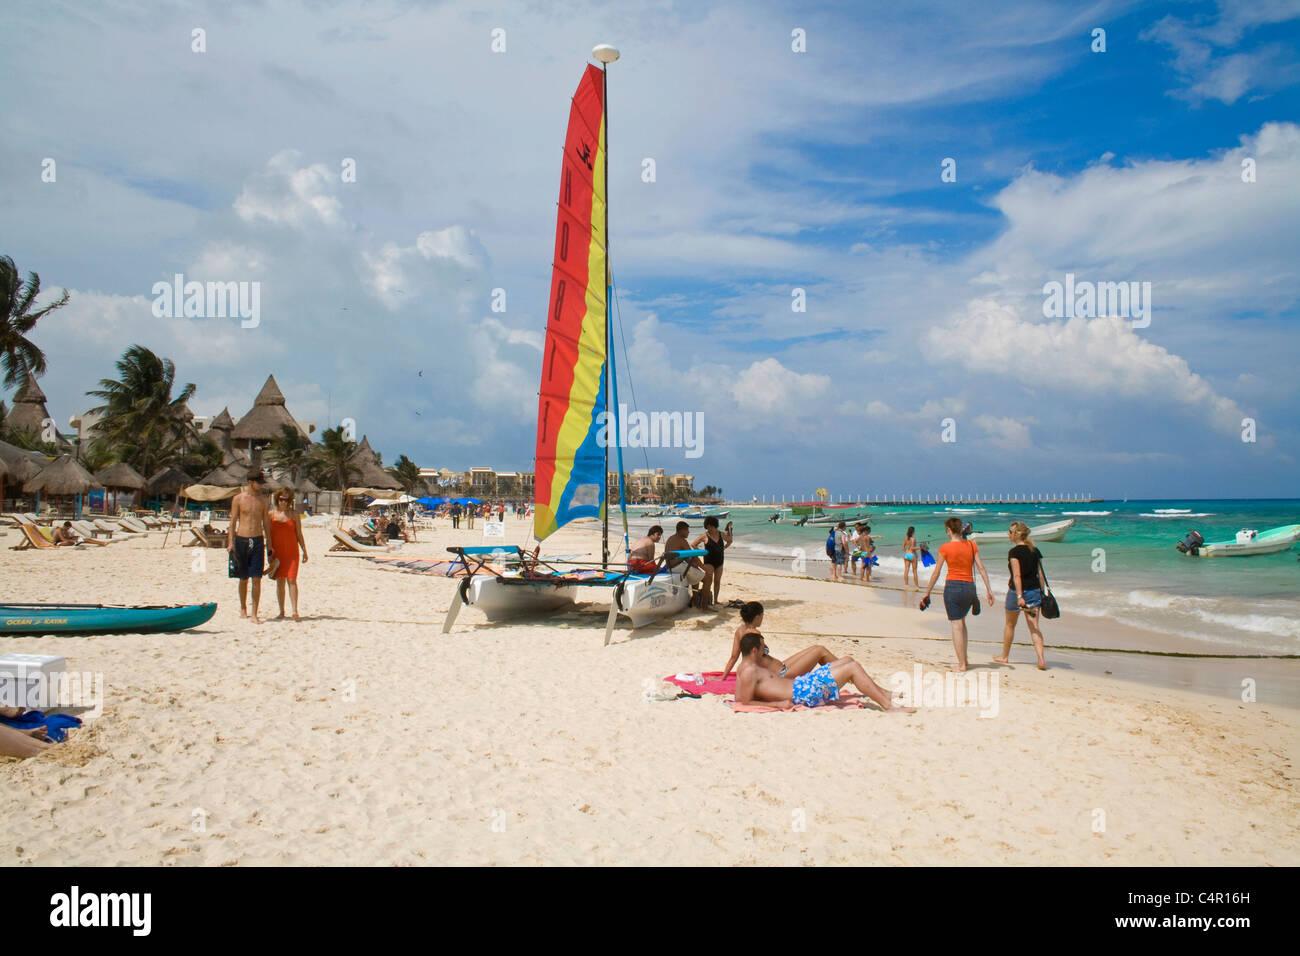 People At The Beach Of Playa Del Carmen Mexico Caribbean Stock